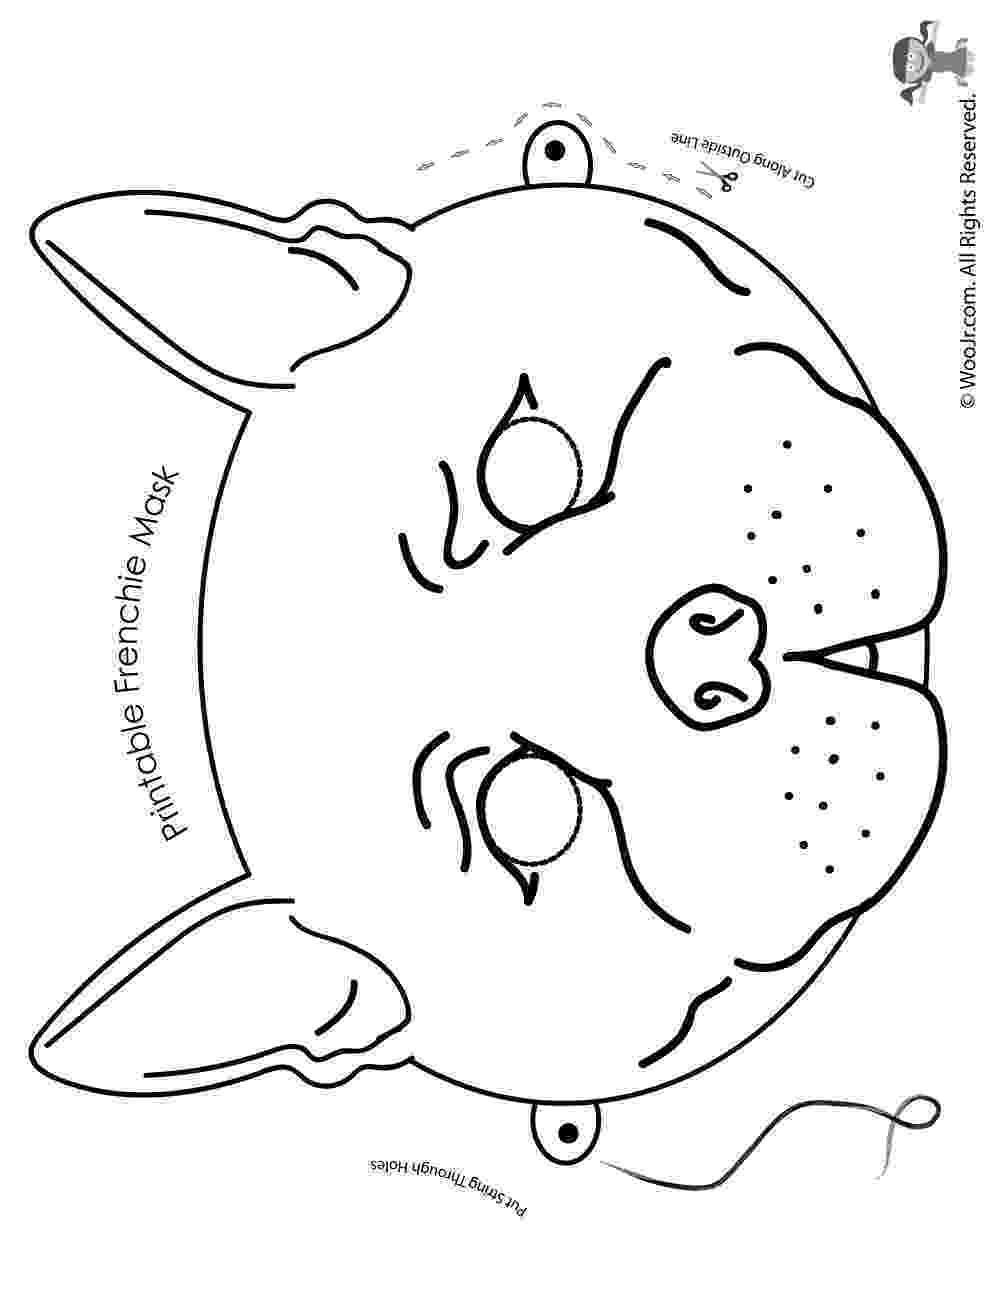 french bulldog coloring pages french bulldog mask coloring page woo jr kids activities french coloring bulldog pages